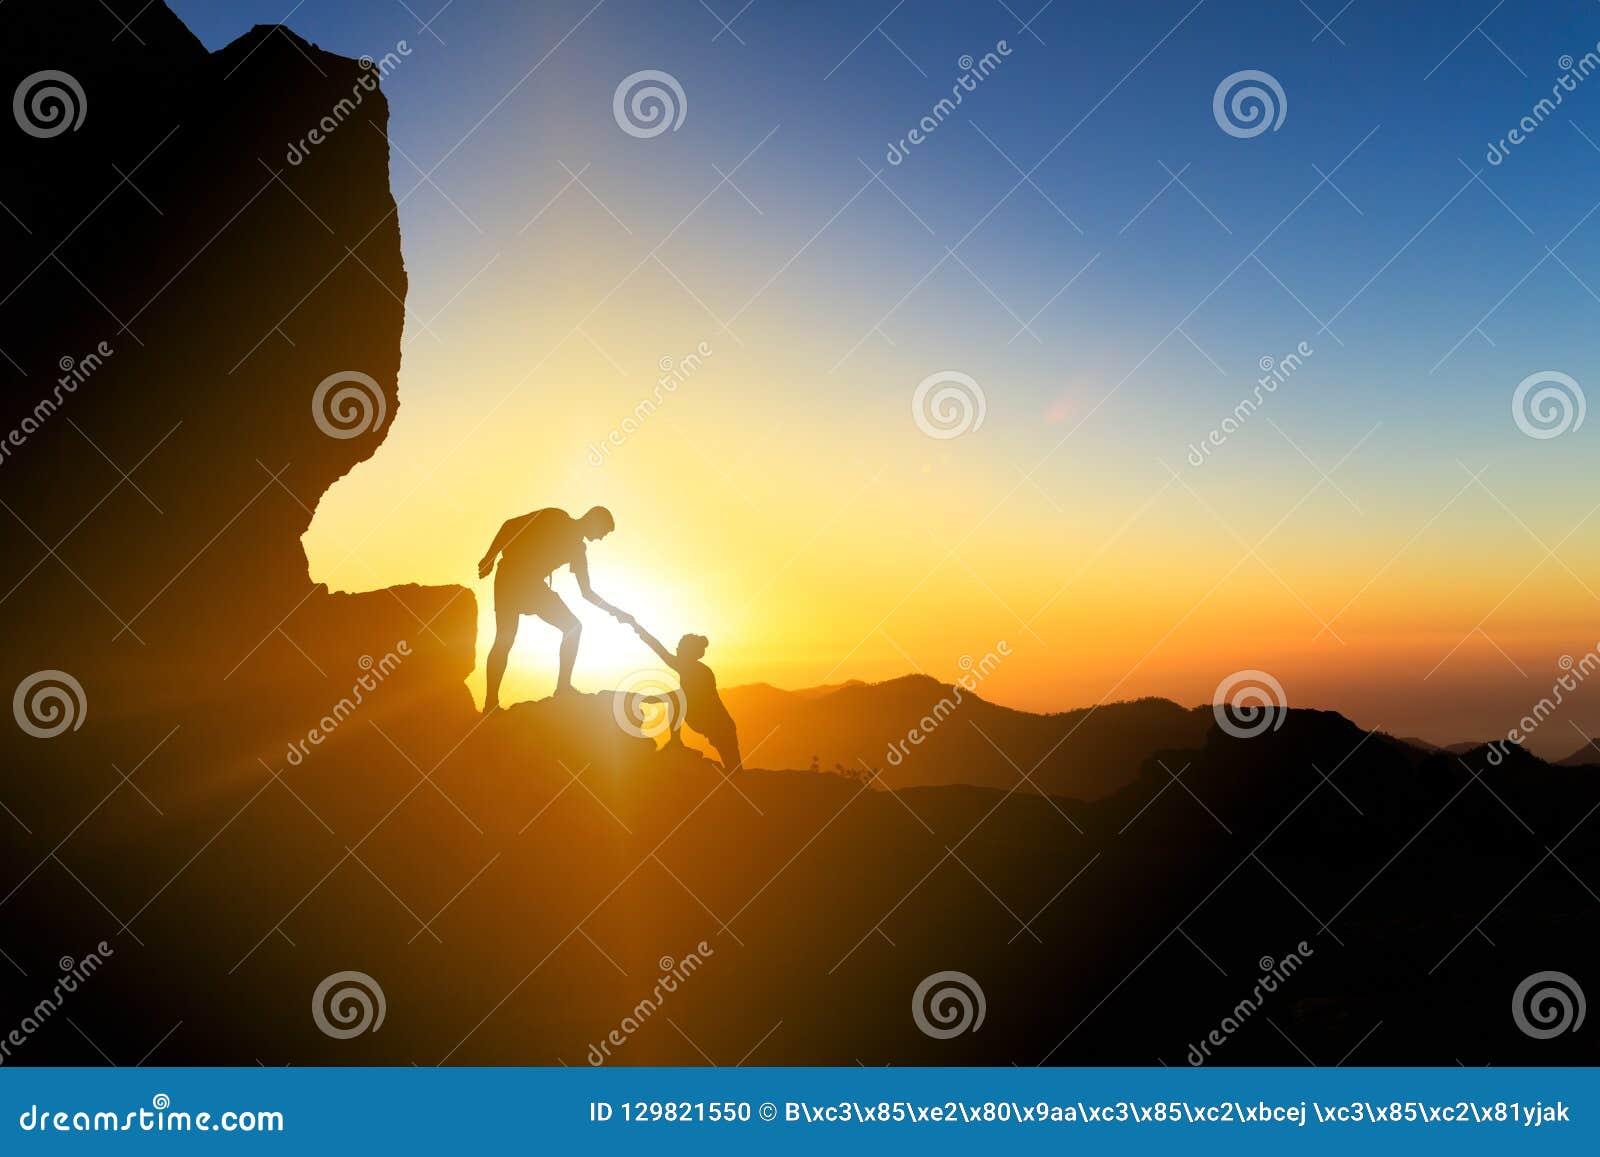 Teamwork helping hand couple climbing at sunset